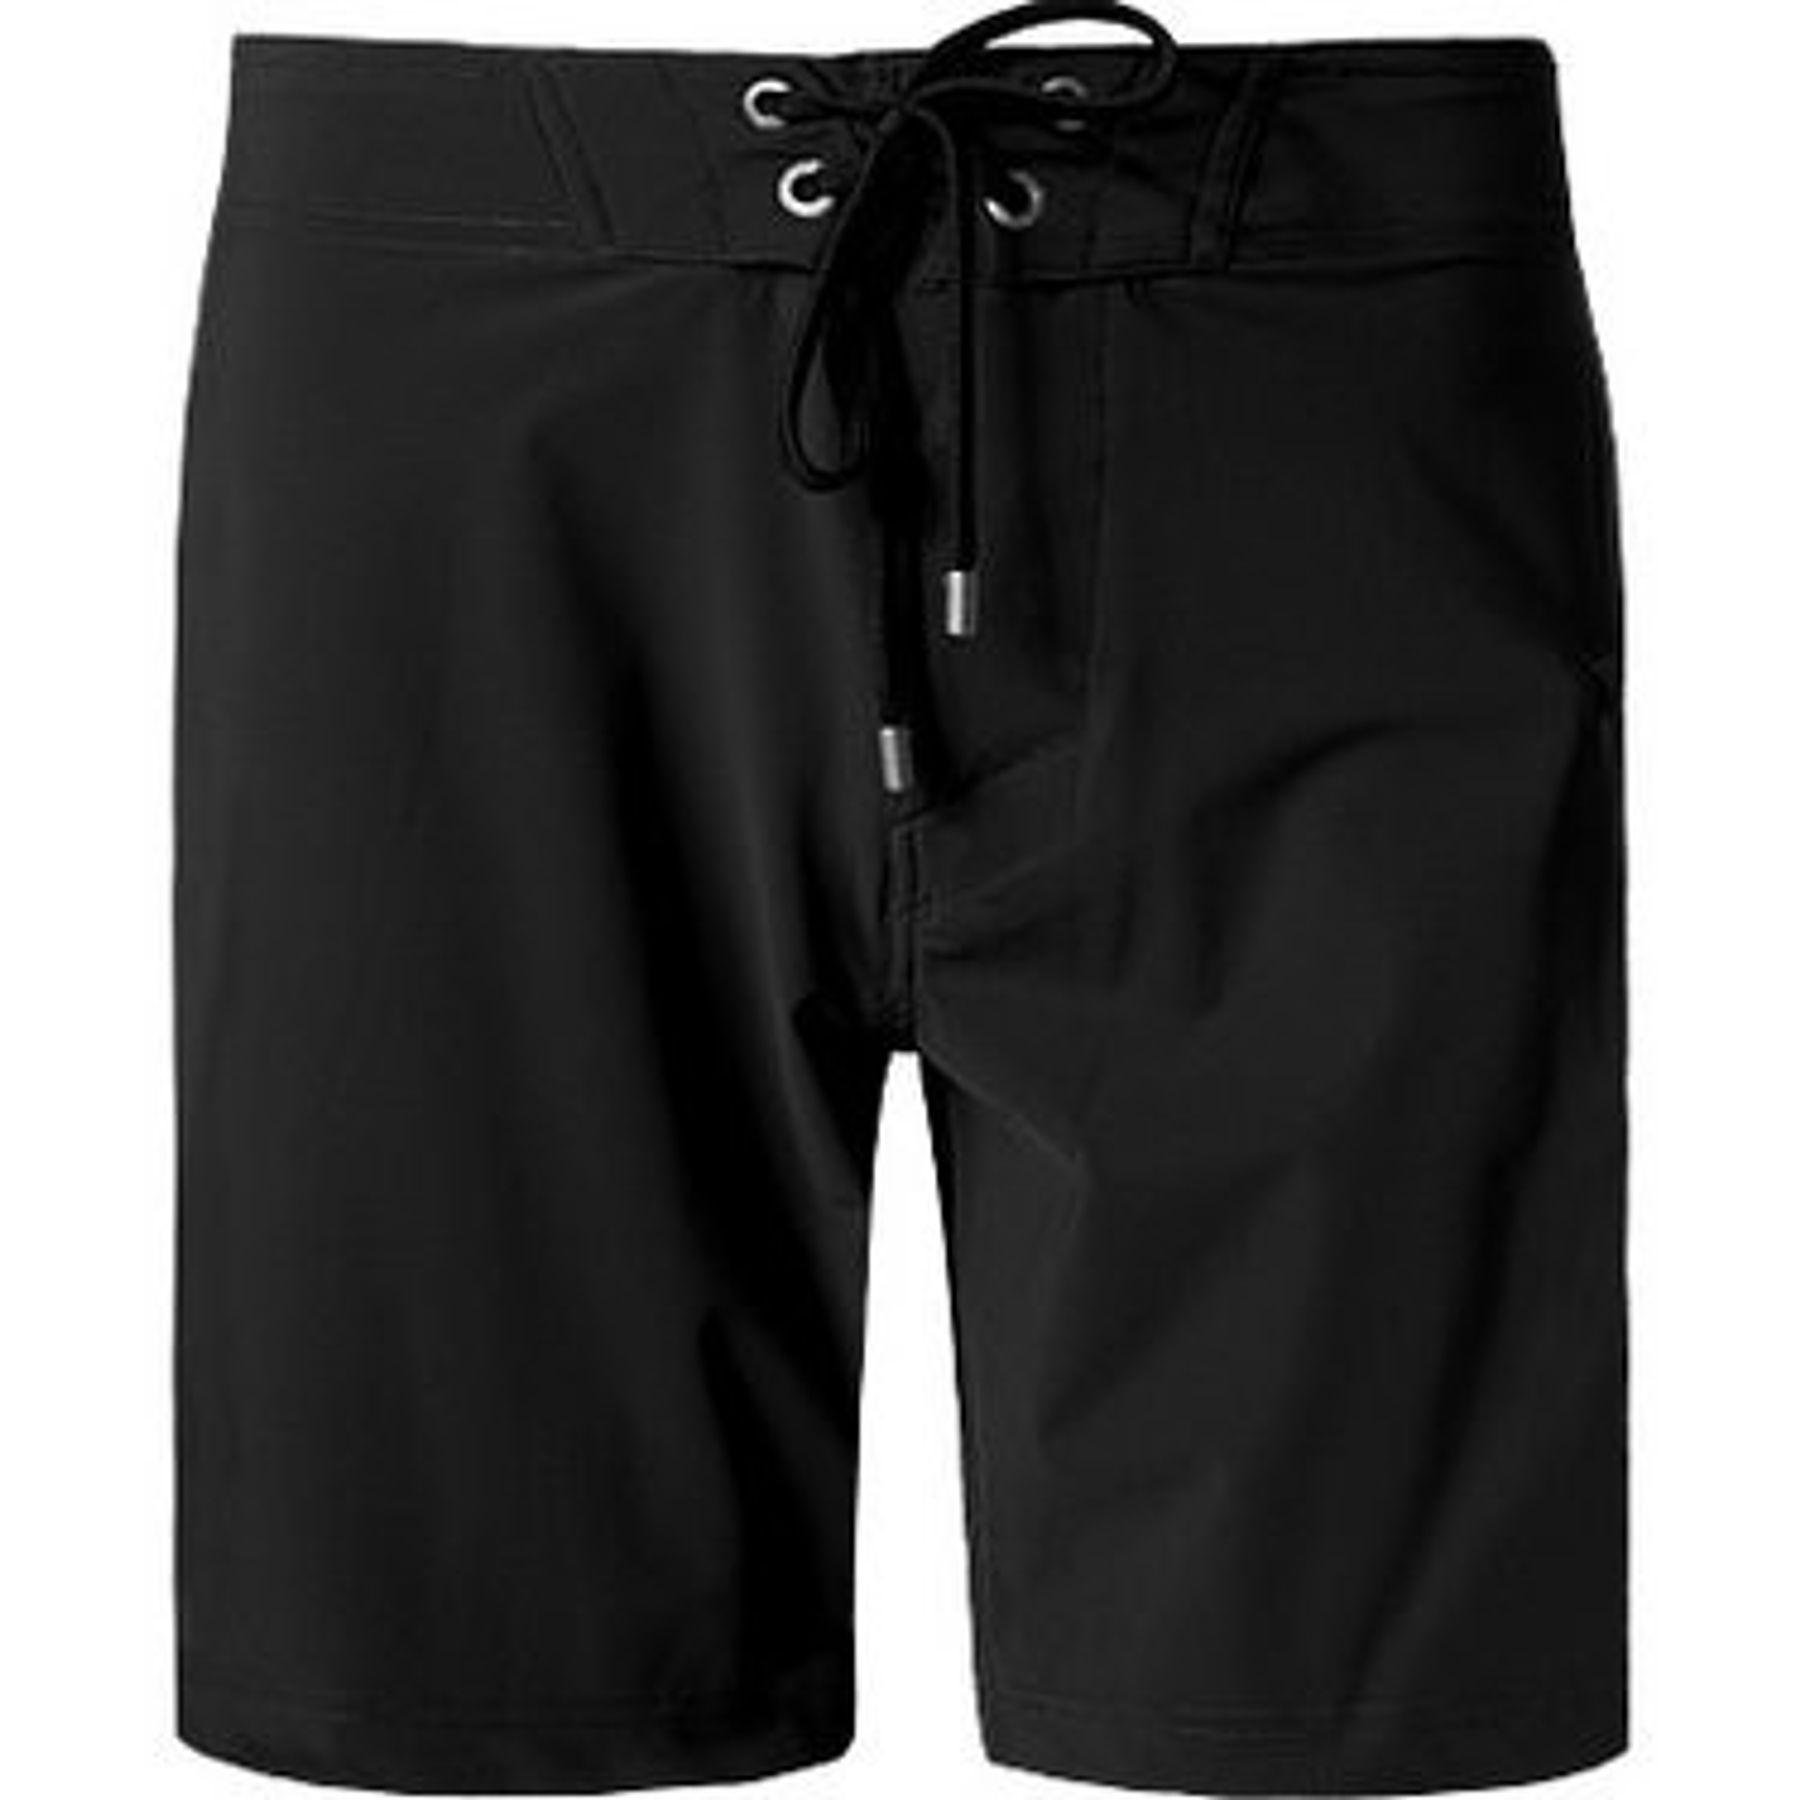 Jockey - Herren Long-Short Beachwear (60023) in 2 Farben – Bild 3